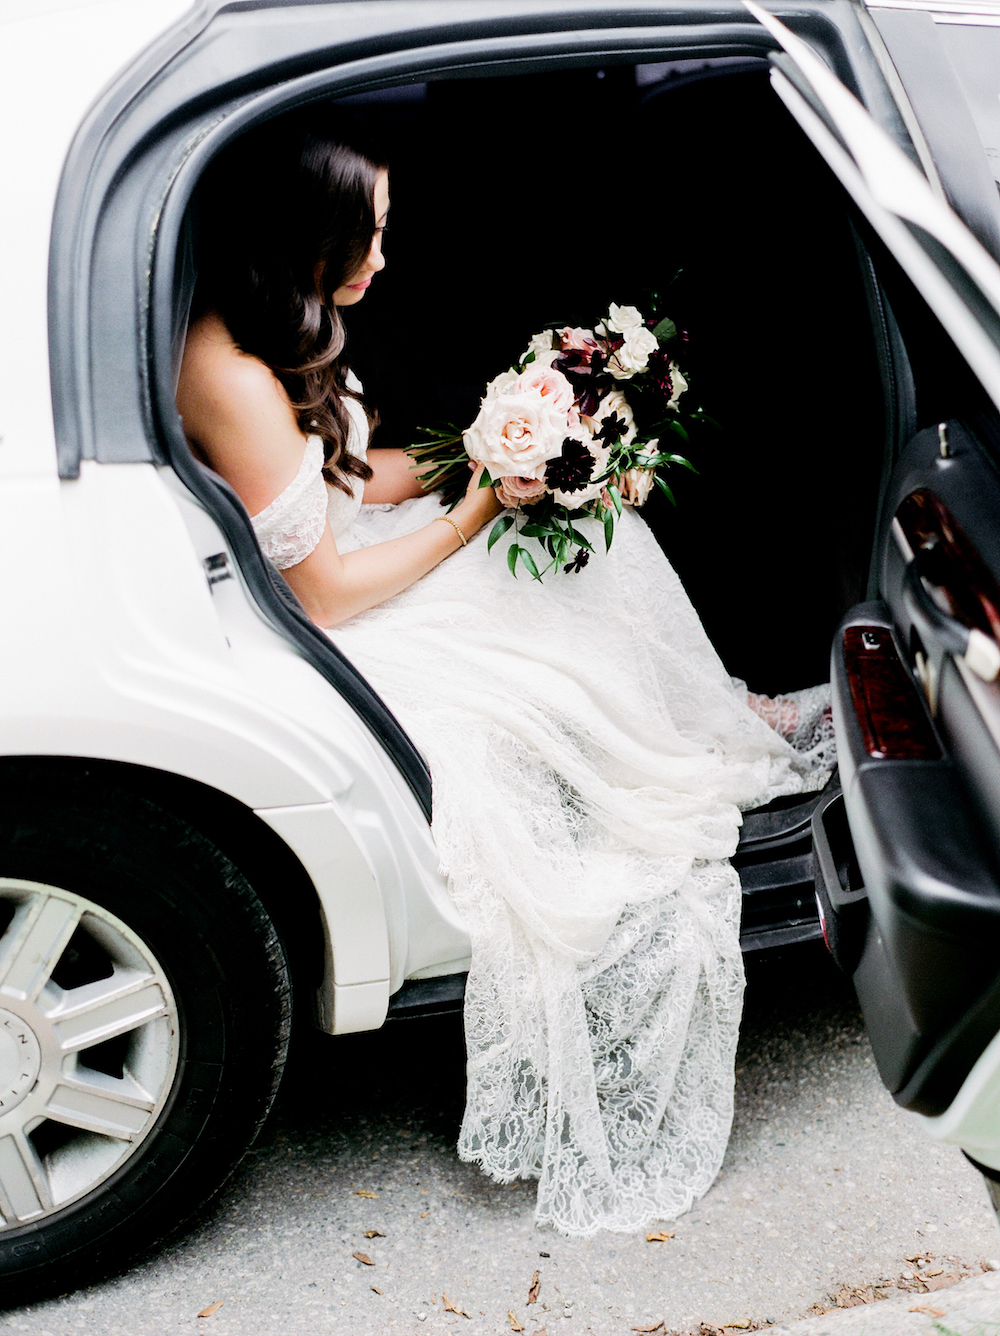 Rose and Dahlia Bouquet - Wedding Florist in Winnipeg